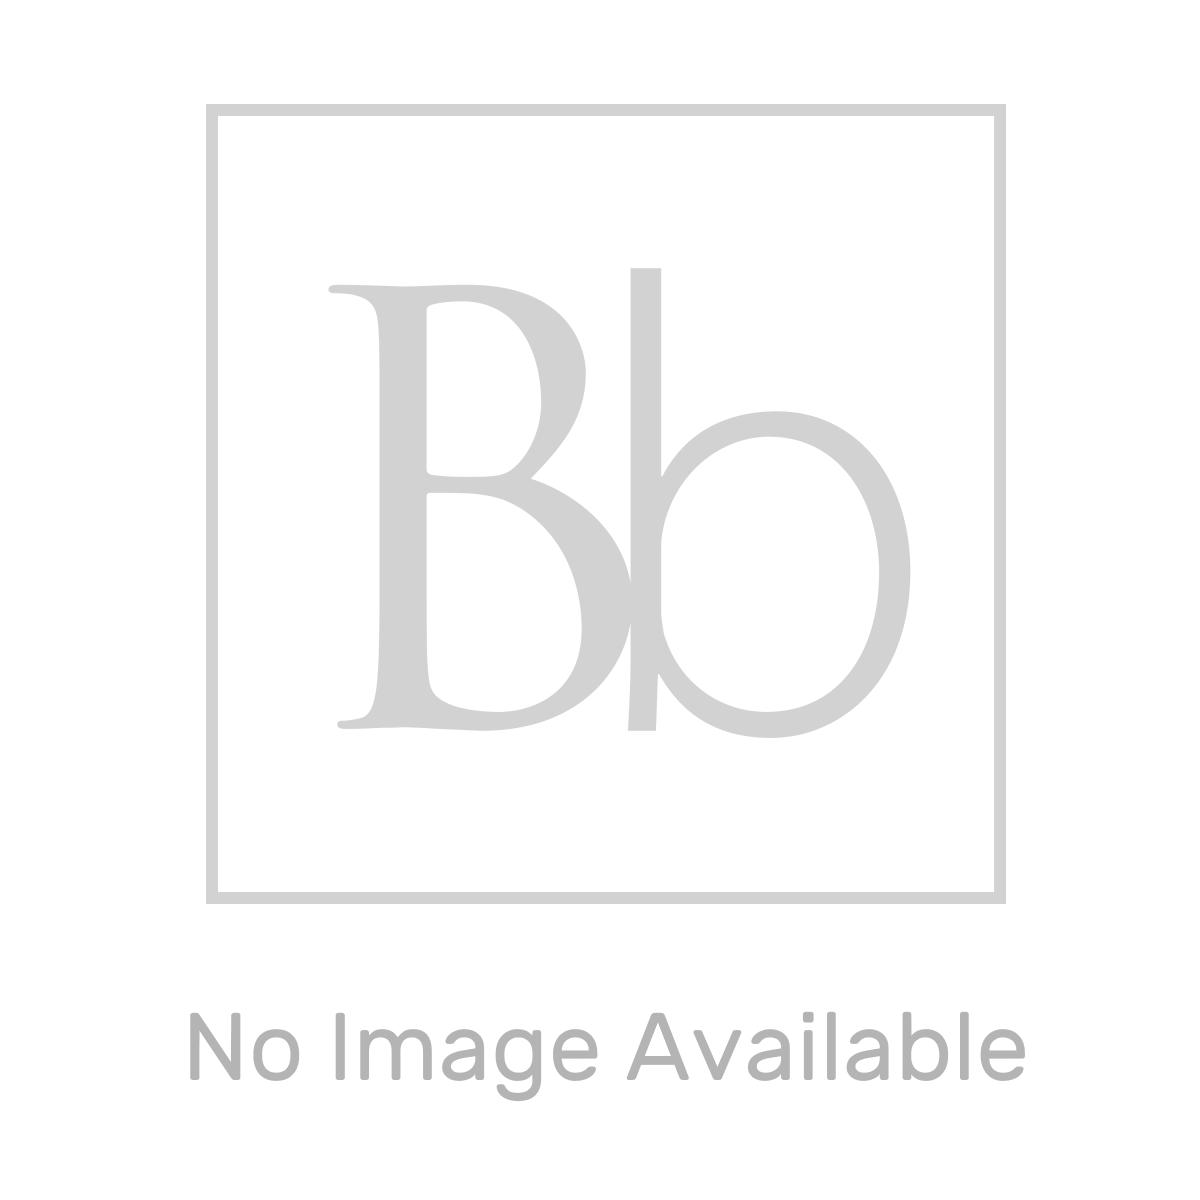 Vitra Neon Space Saving Shower Bath 1700 x 500mm Right Hand